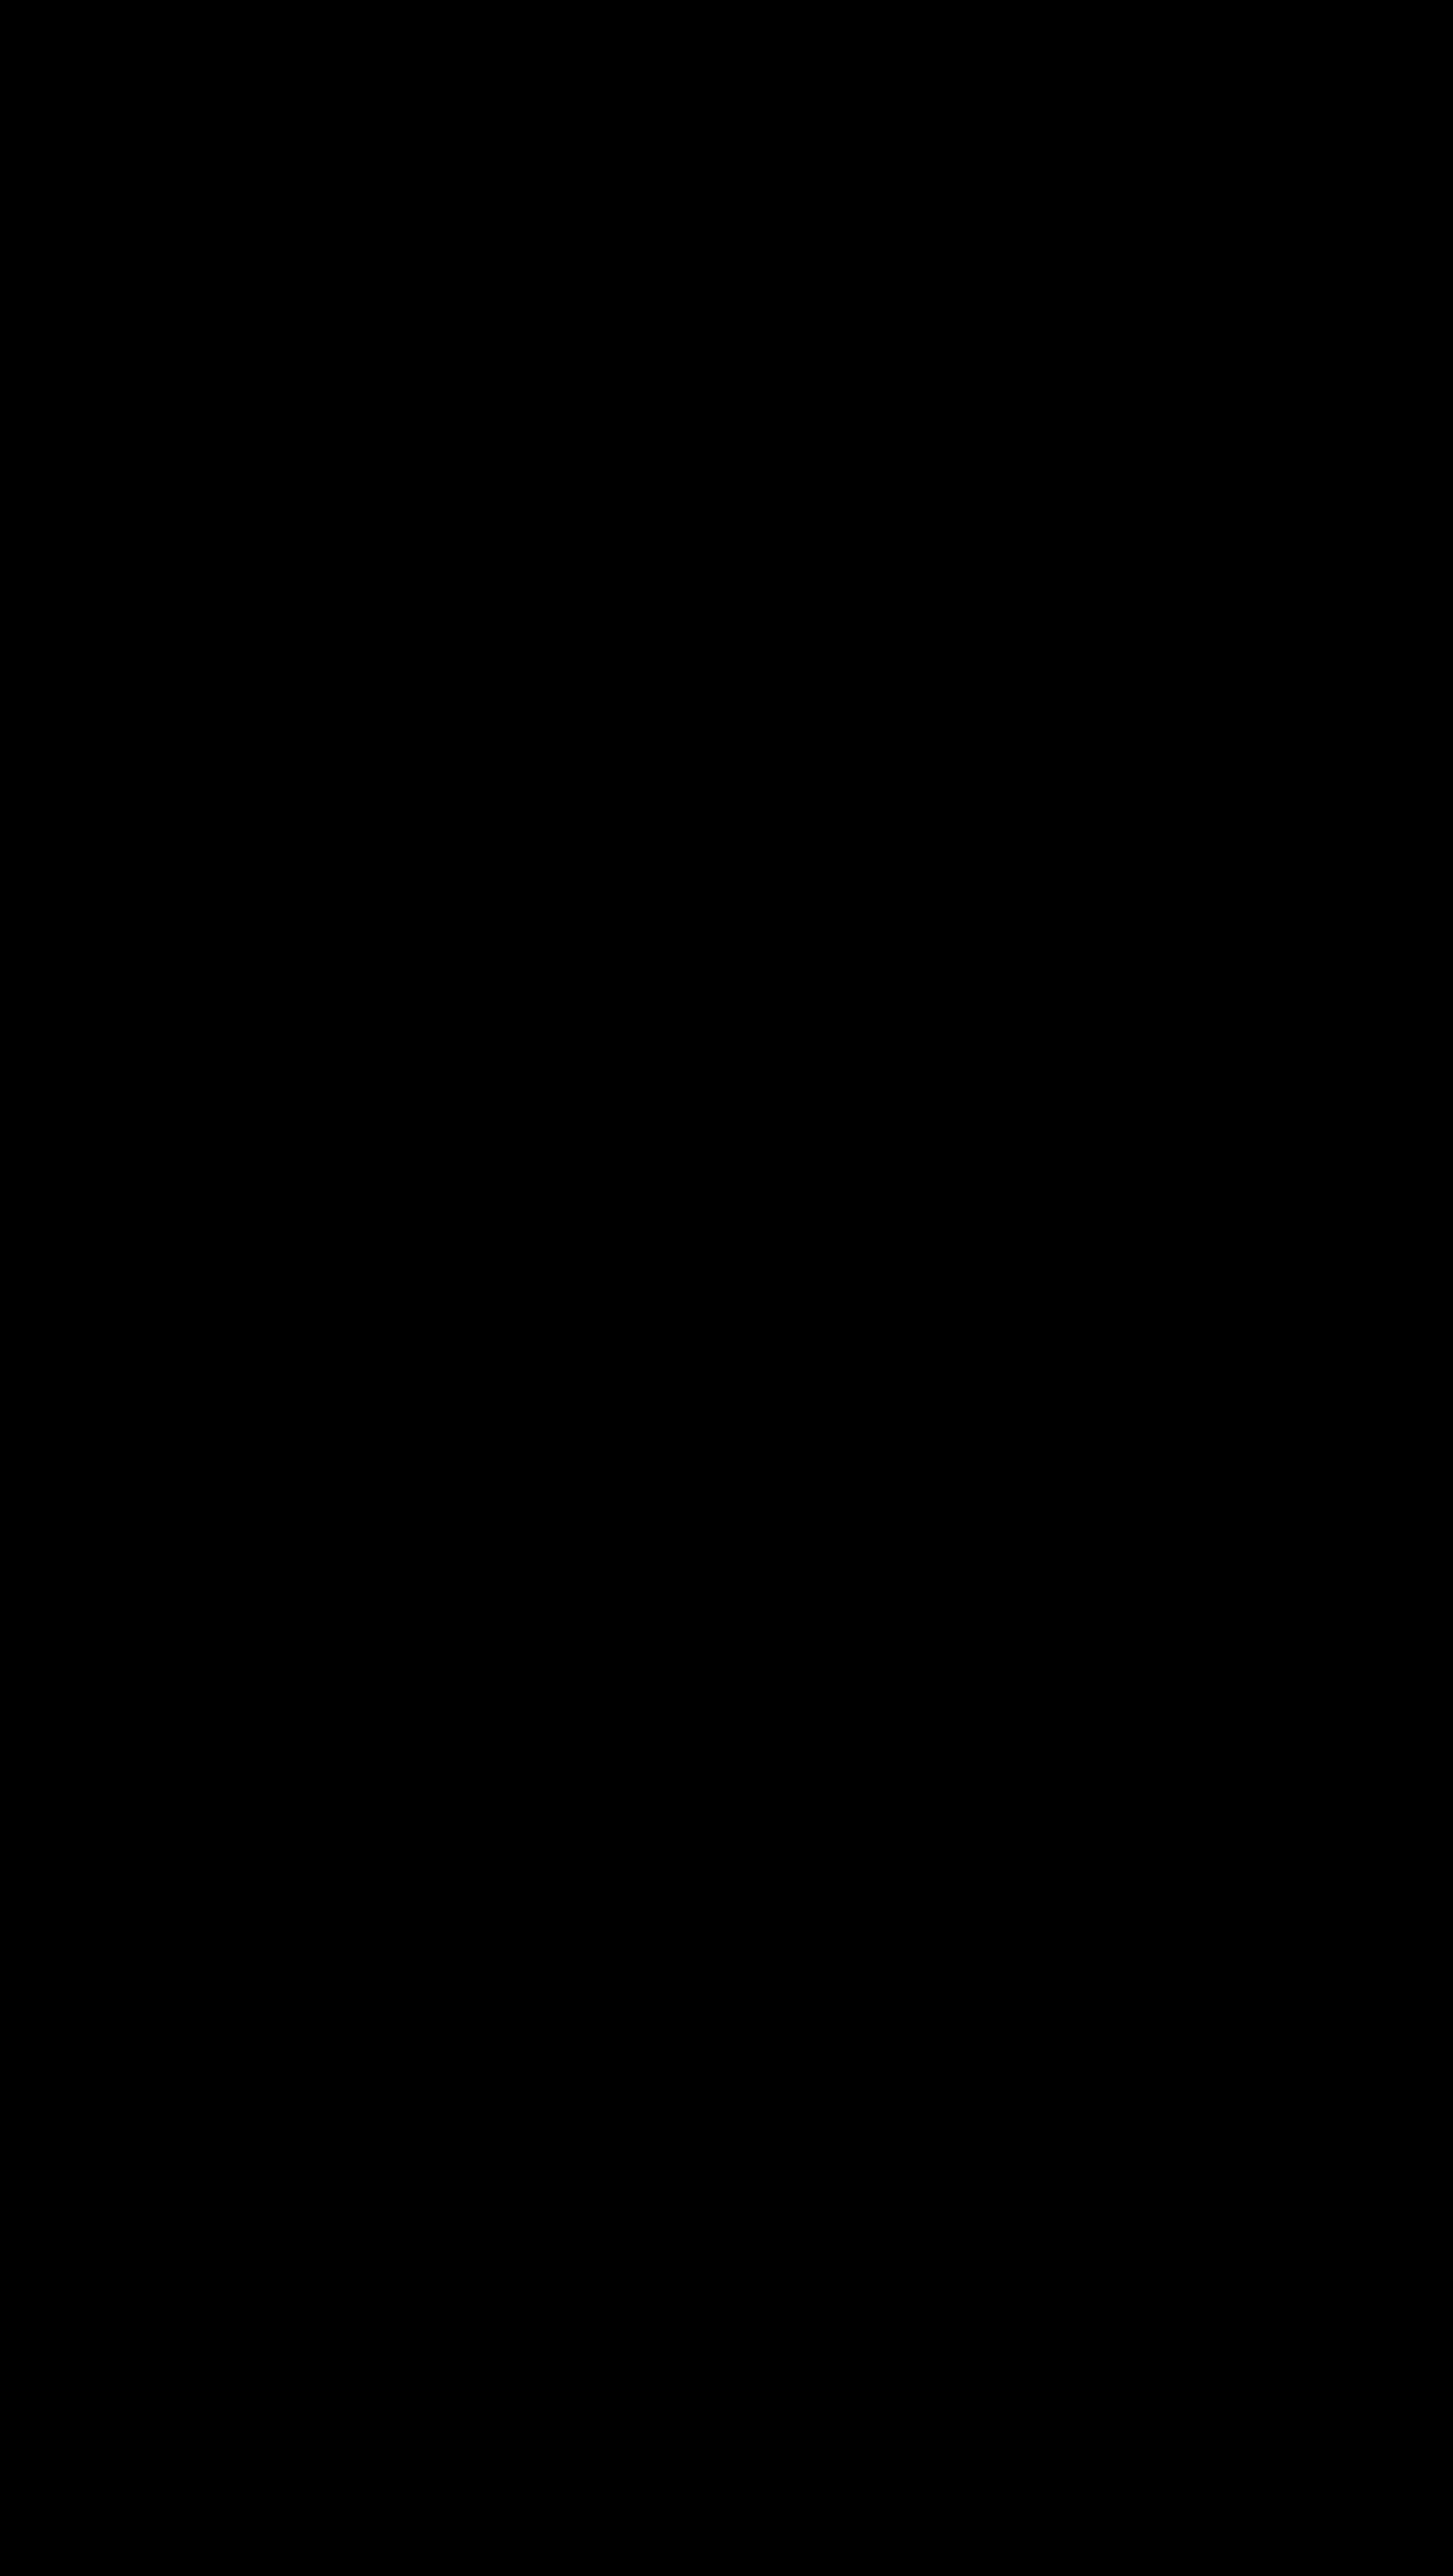 2000x3546 Filechalice Silhouette.svg